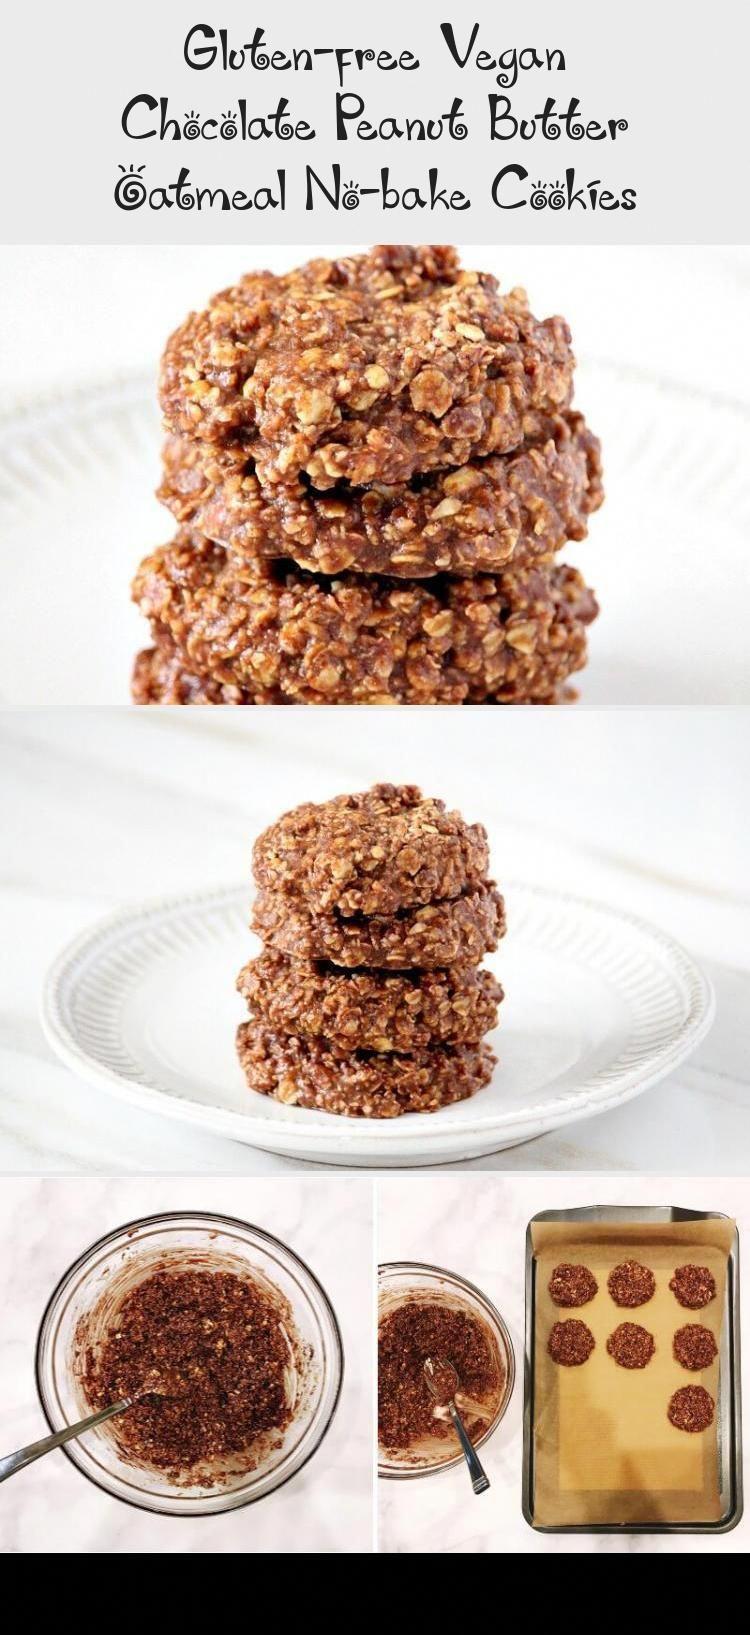 The Original Healthy Plant Based Gluten Free Vegan Chocolate